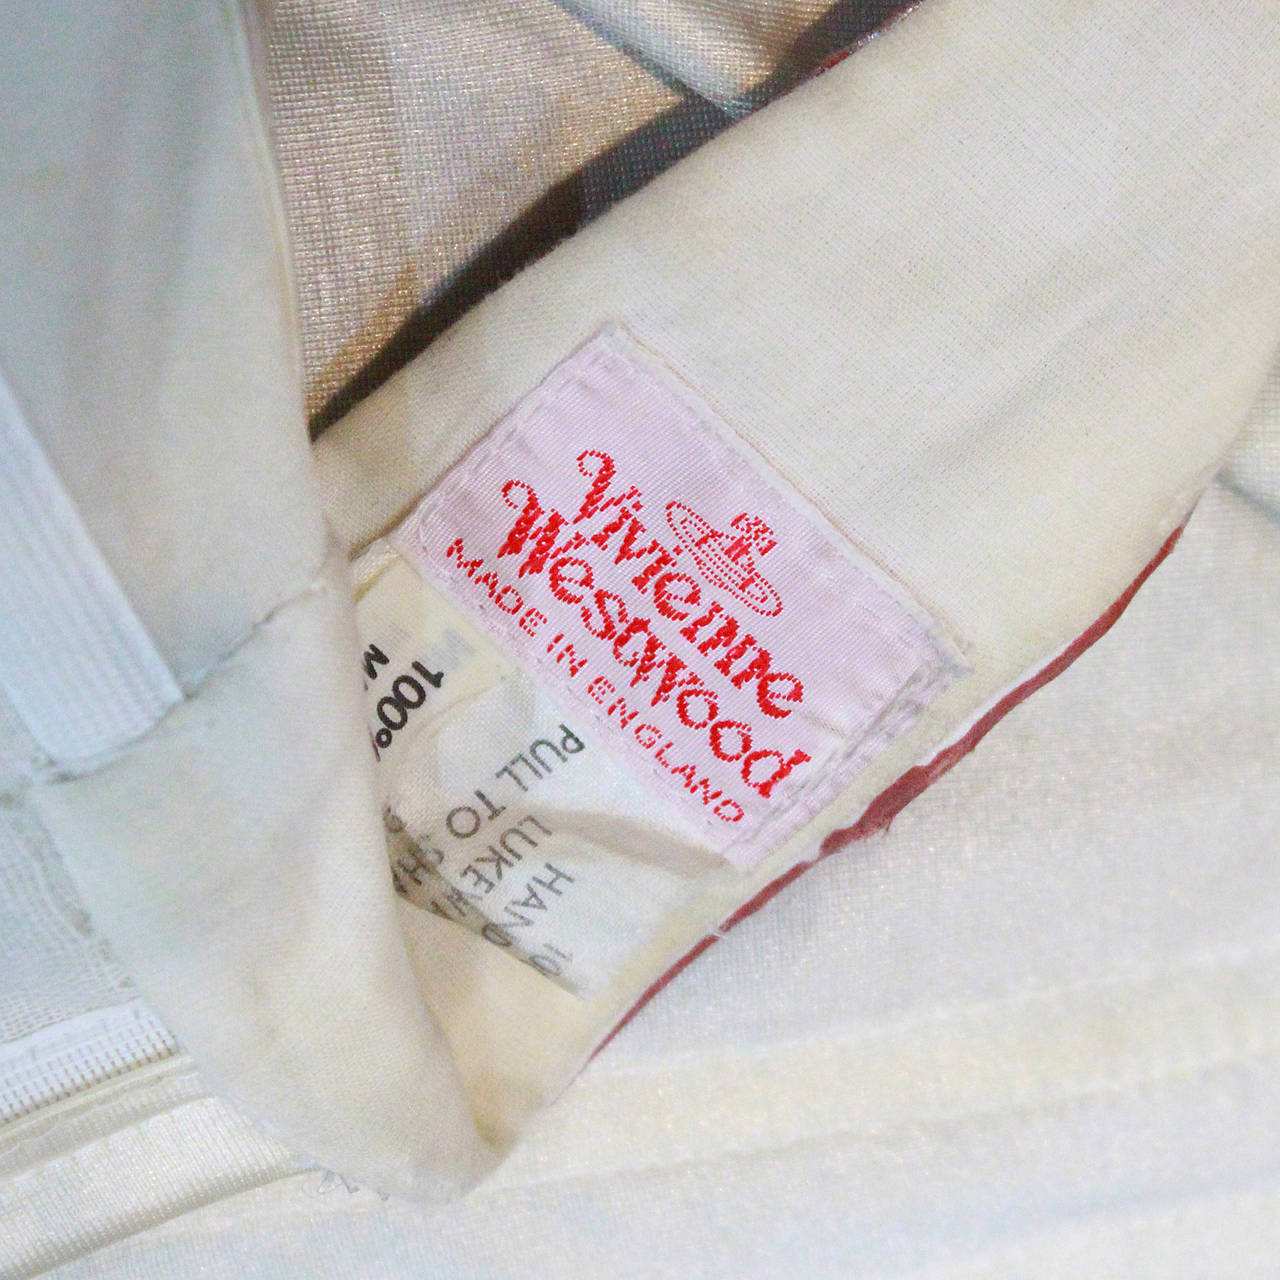 Rare Vivienne Westwood Boucher Corset From The Portrait Collection c.1990 5